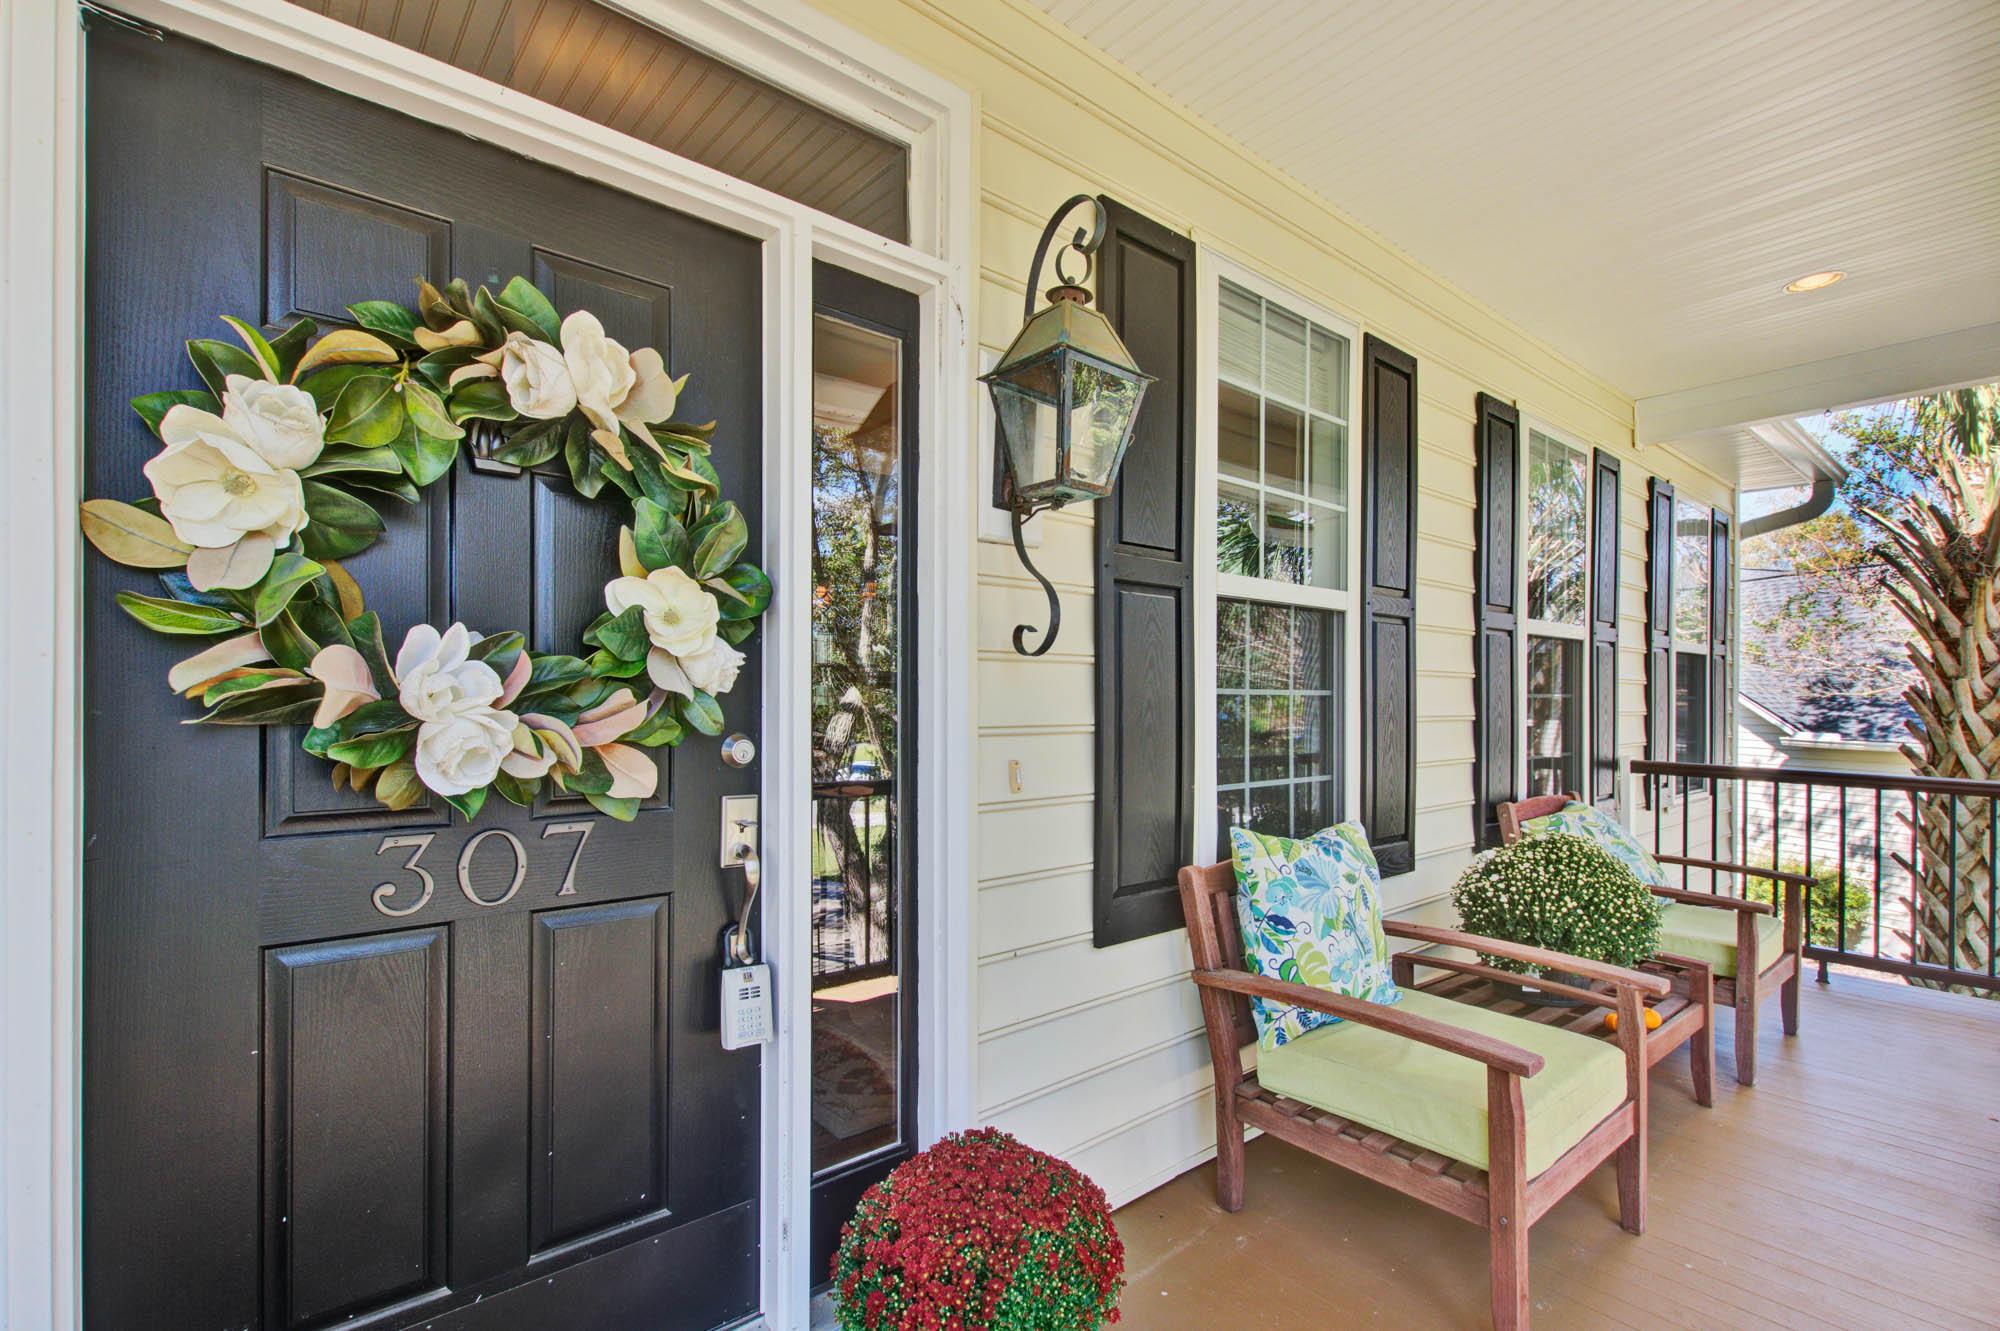 St Thomas Point Homes For Sale - 307 Jamesbury, Charleston, SC - 0